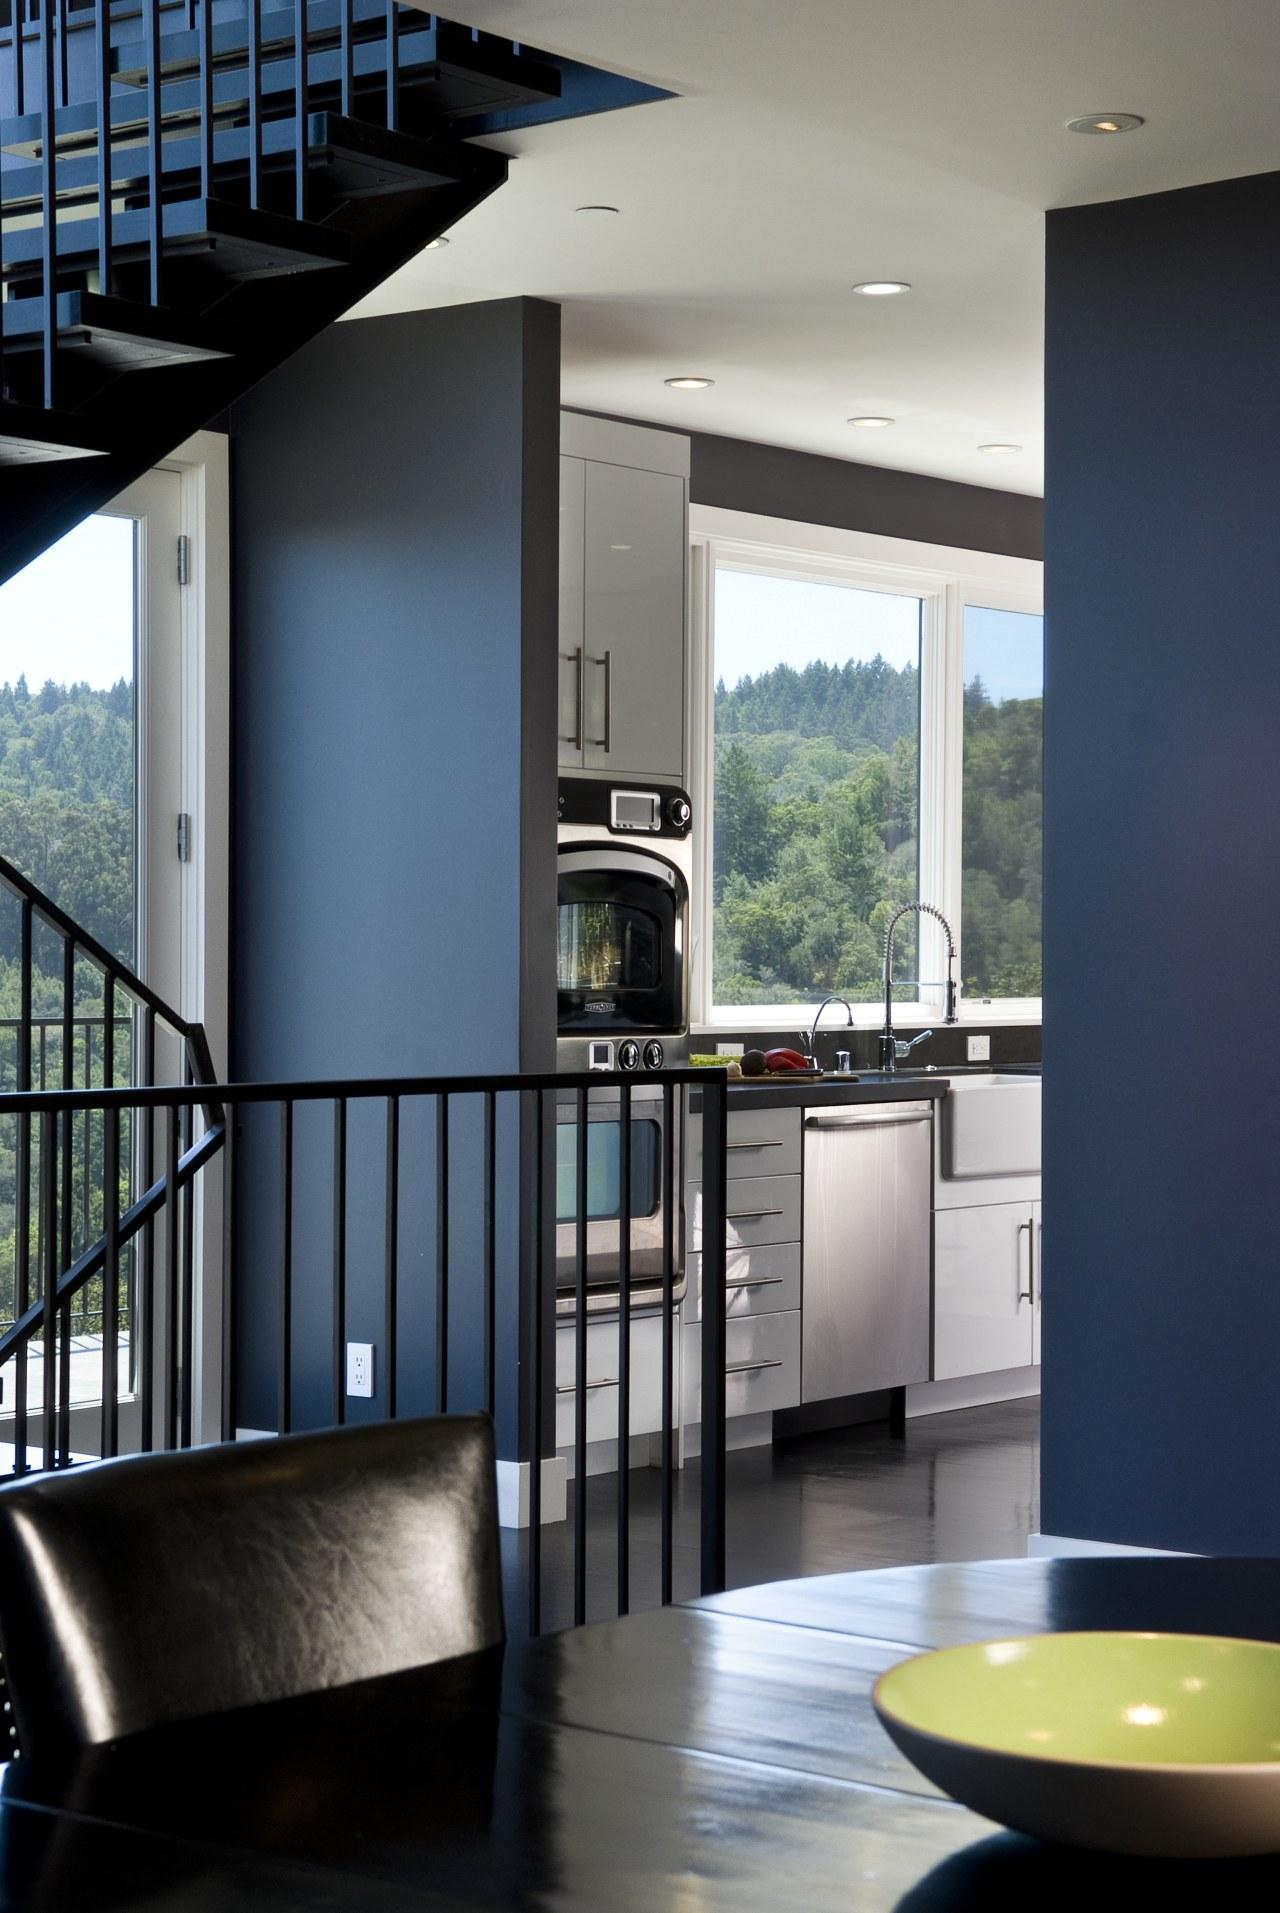 Euro style cabinetry doors. Dark quartzite counter tops. architecture, home, house, interior design, window, black, gray